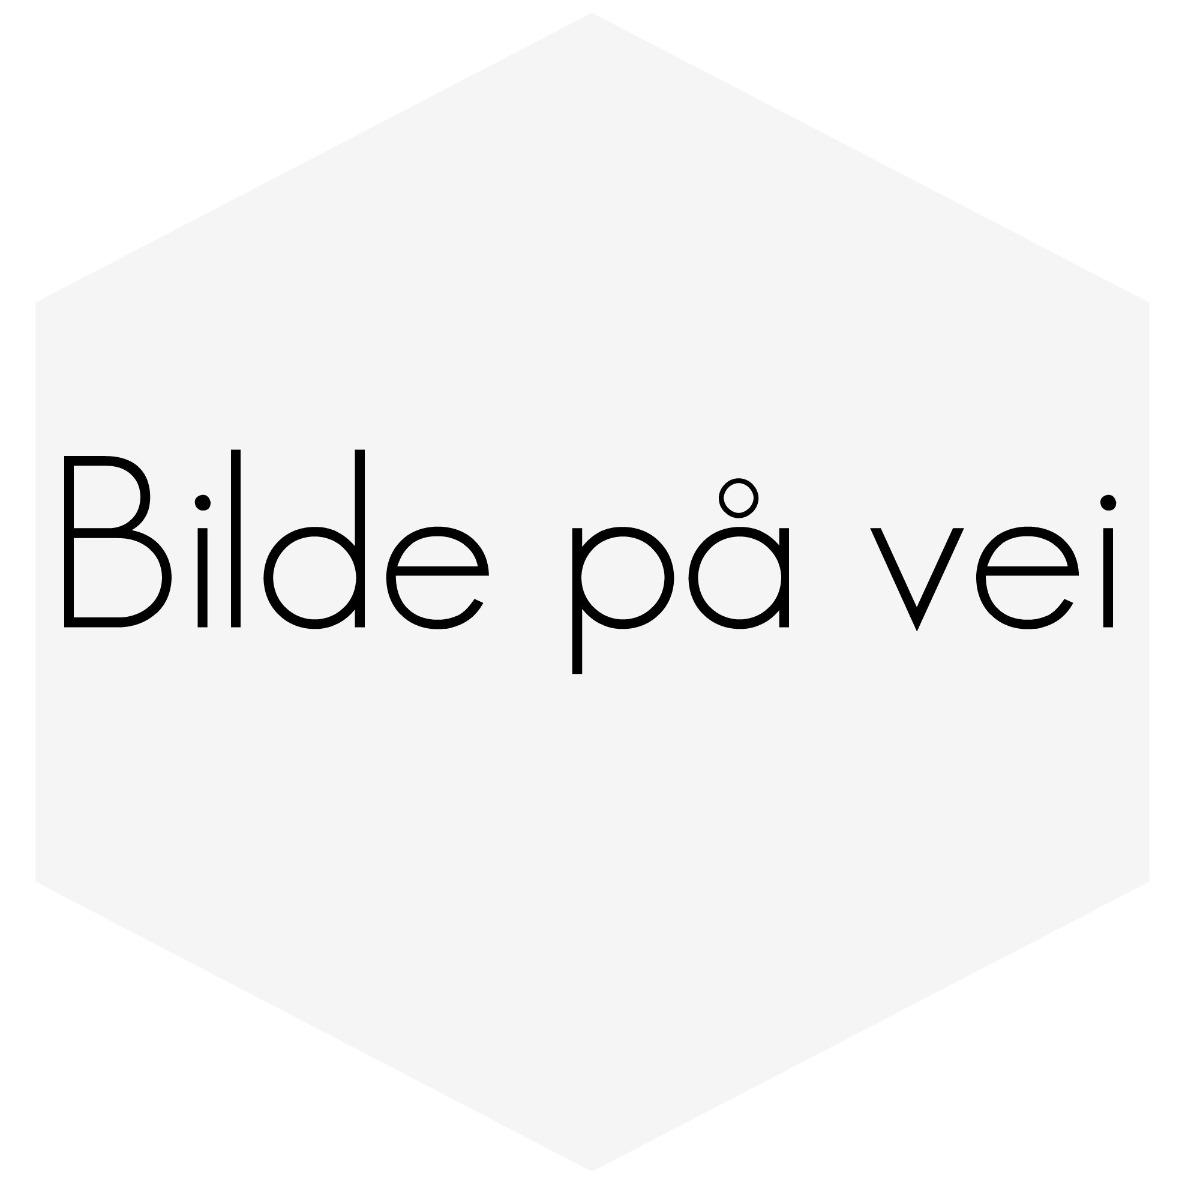 NIPPEL T TYPE TIL EKS. SLANGE PÅ TURBOTRYKK MÅLER.